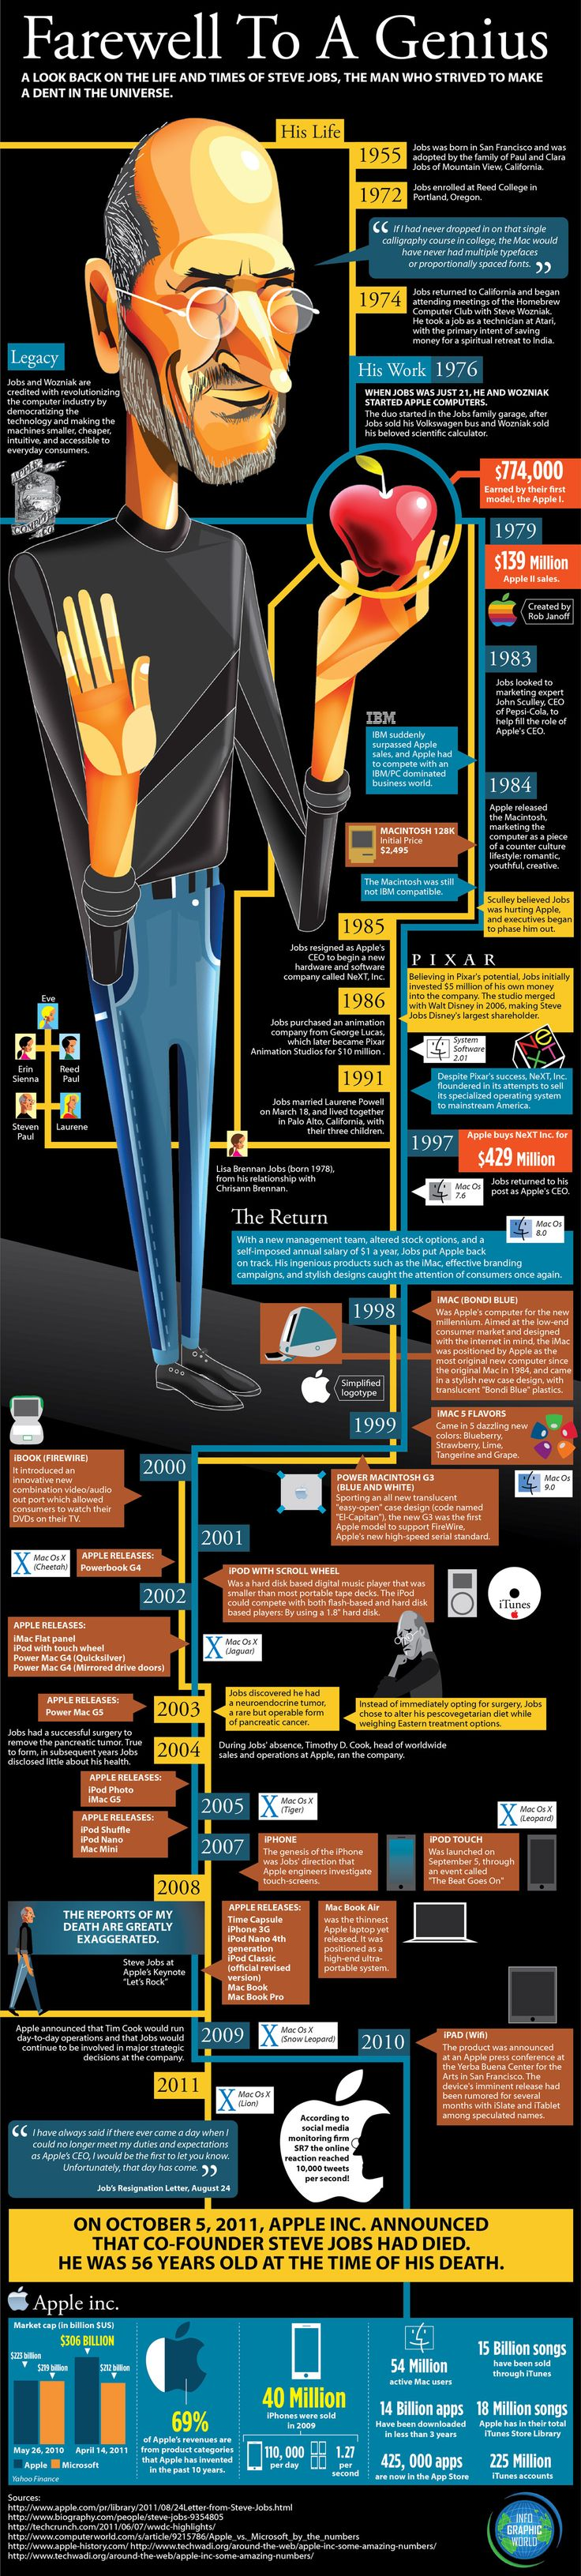 The life of Steve Jobs | La vita di Steve Jobs